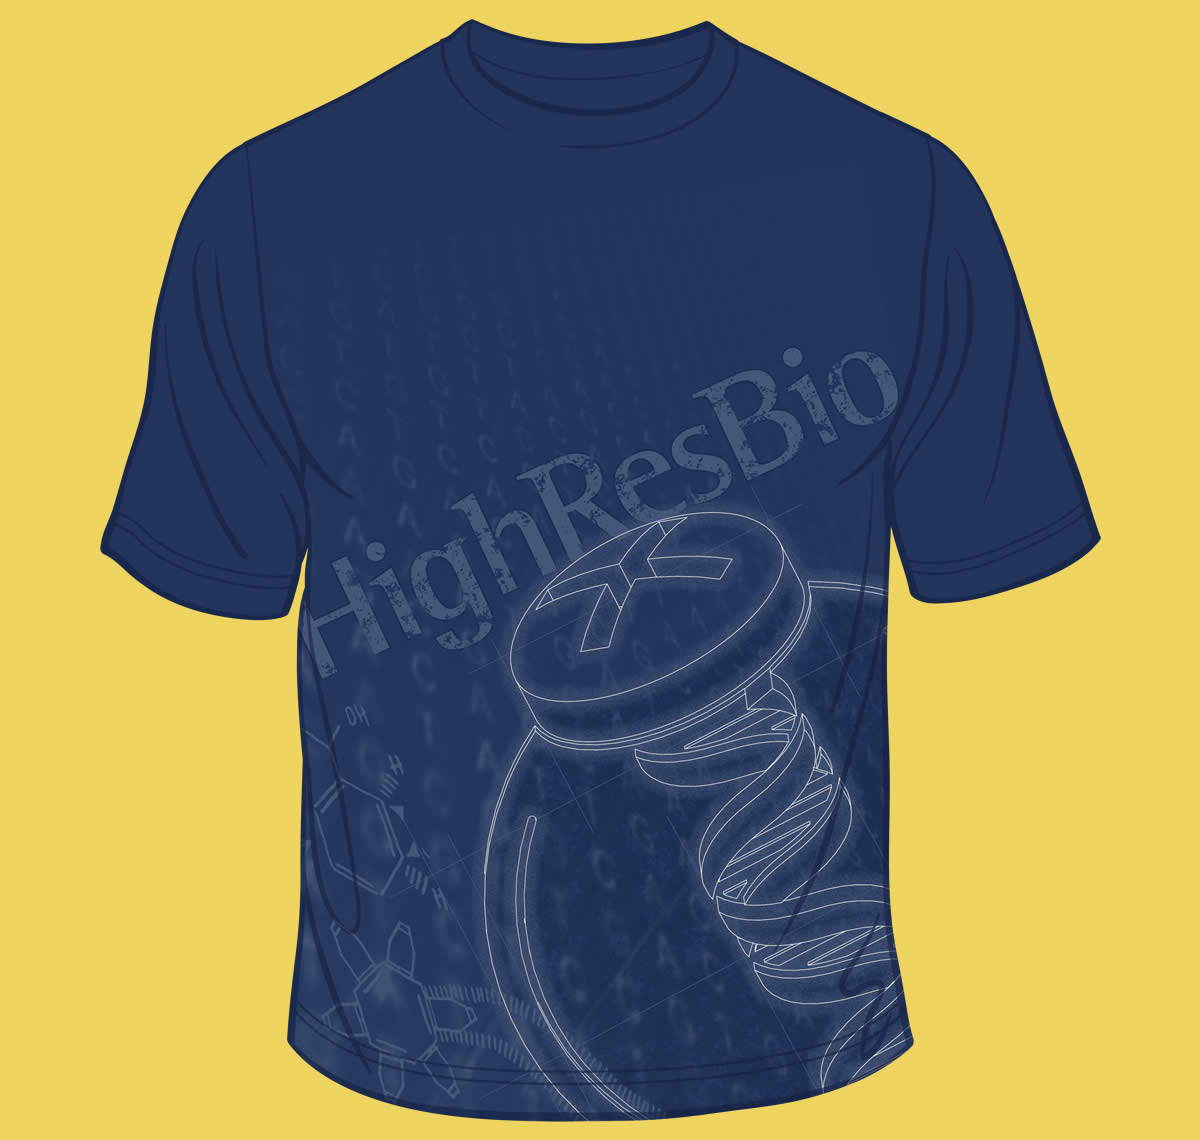 HighRes BioSolutions T-shirt